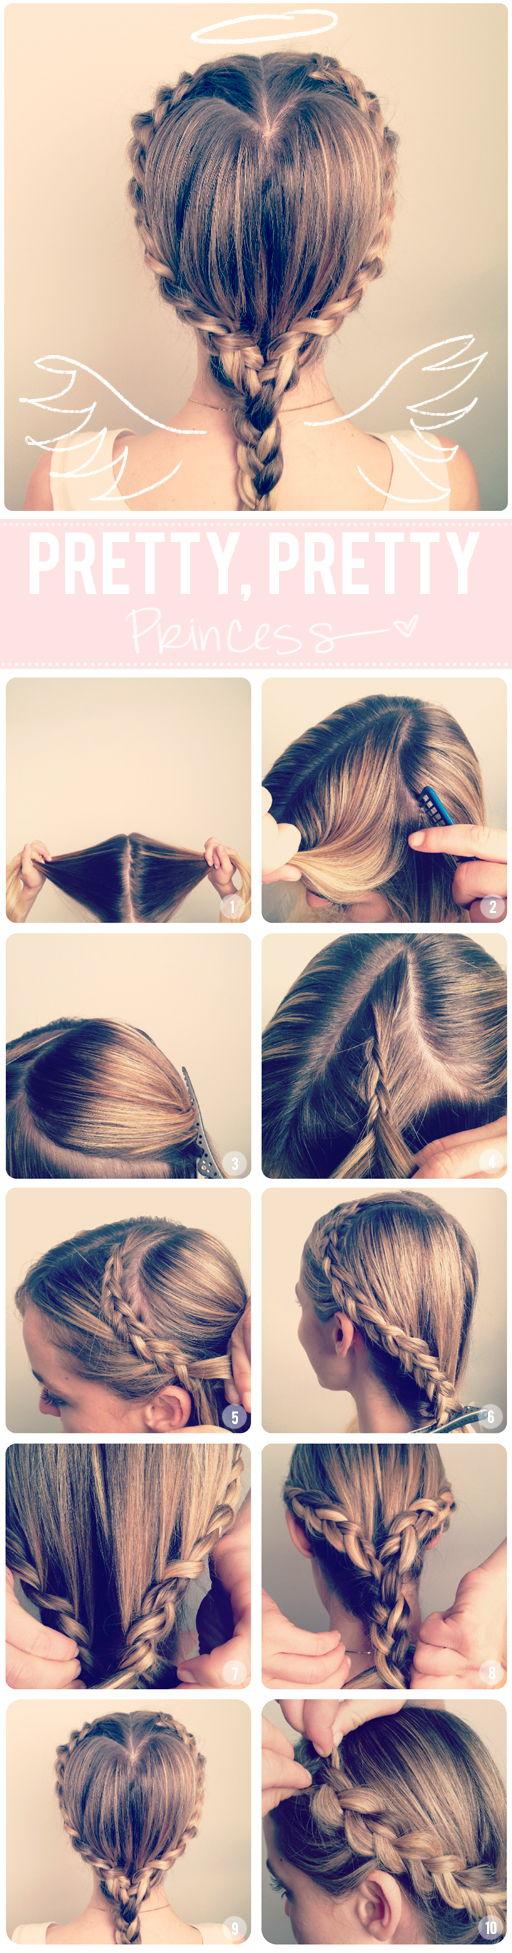 DIY Heart Braid Hairstyle